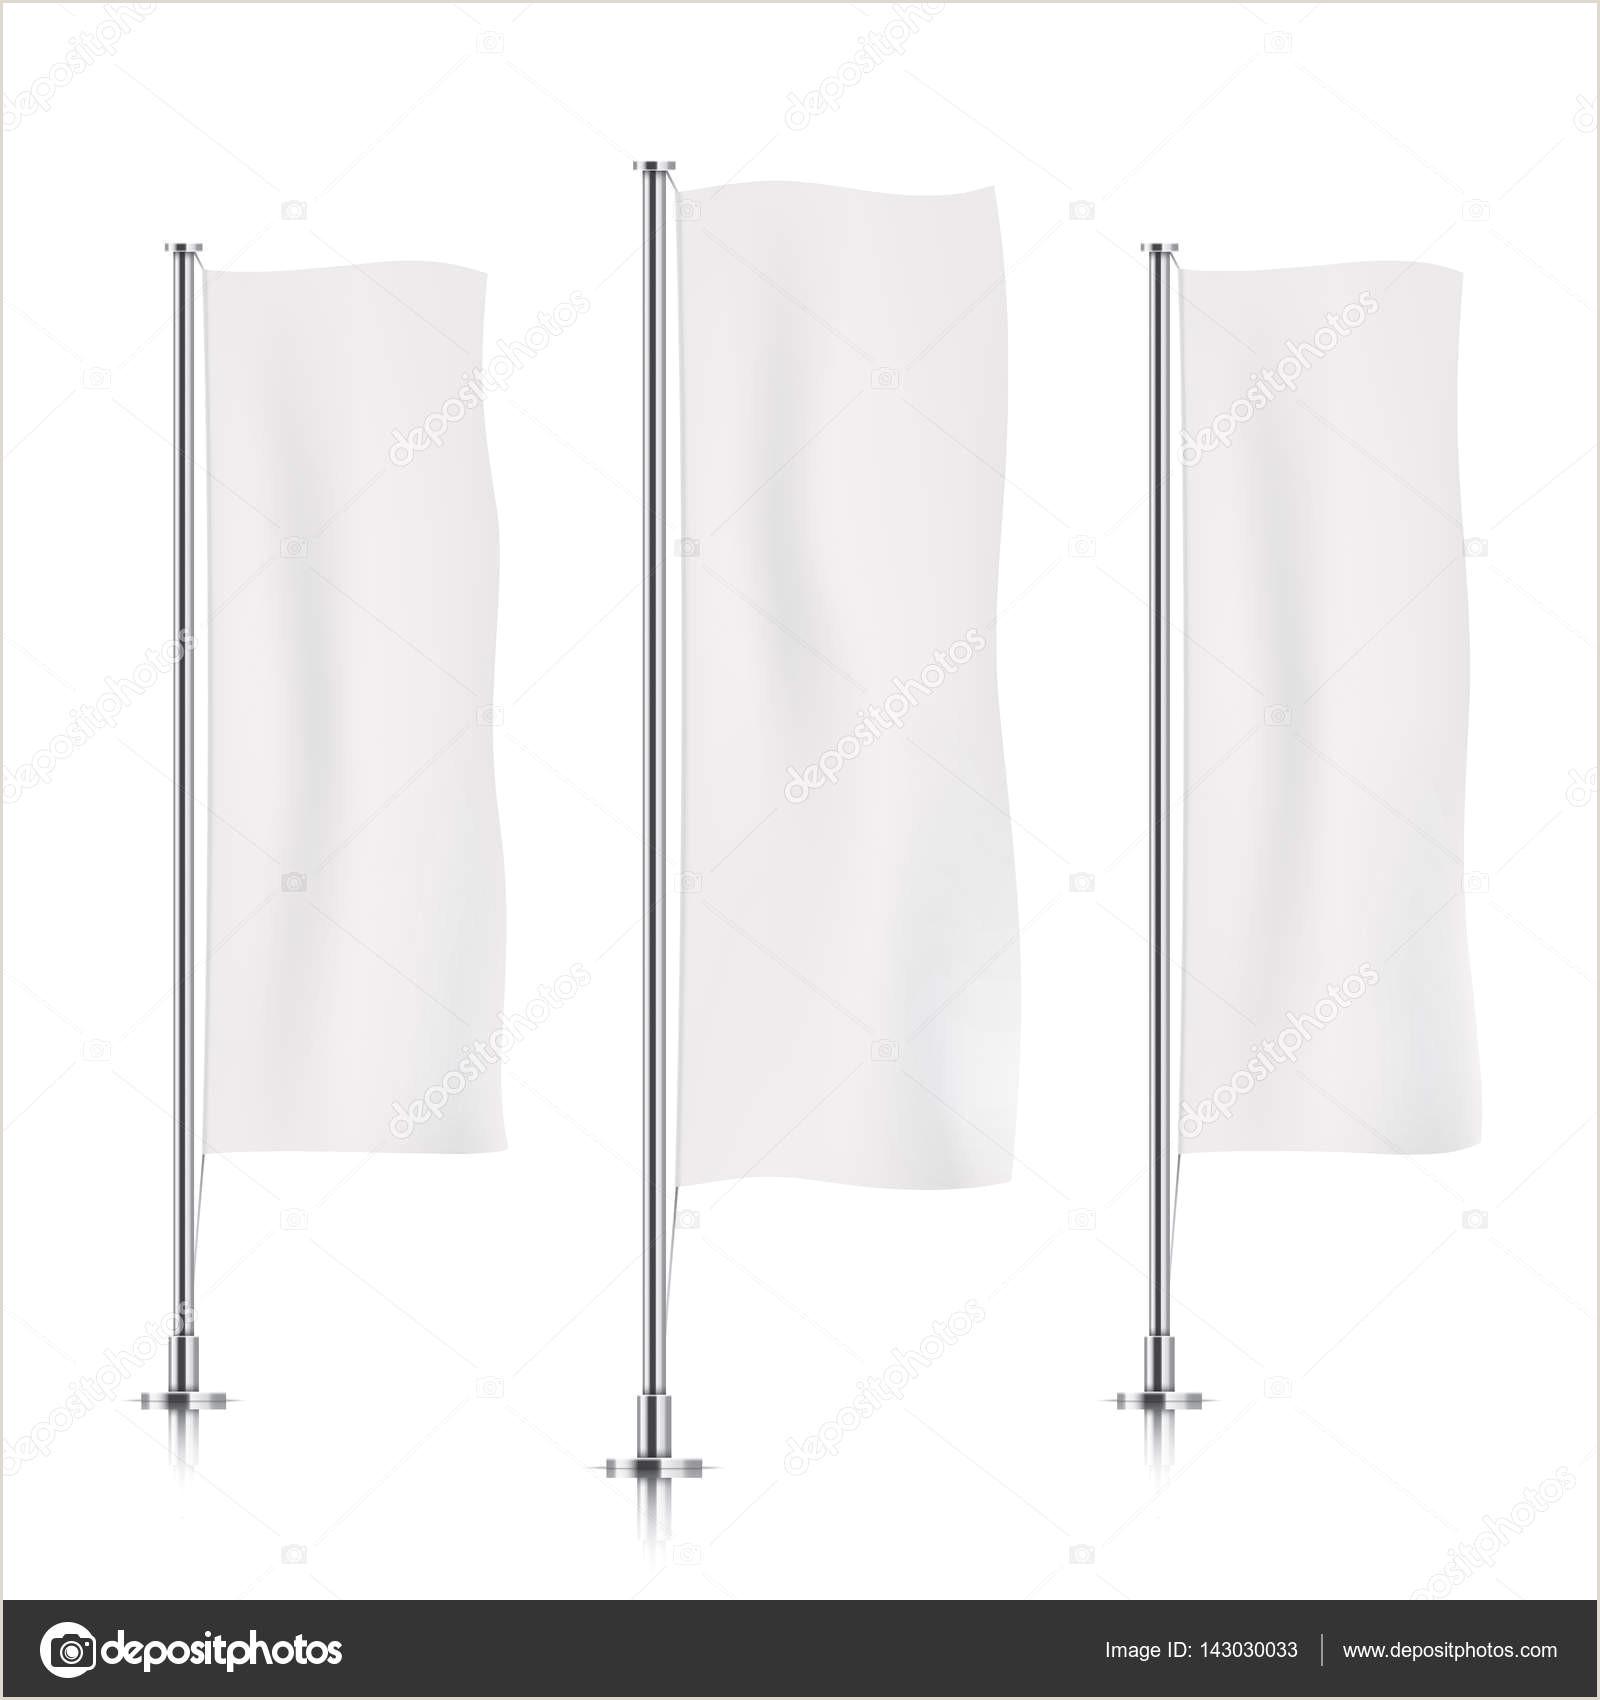 Vistaprint Vertical Banner Stand White Vertical Banner Flag Templates